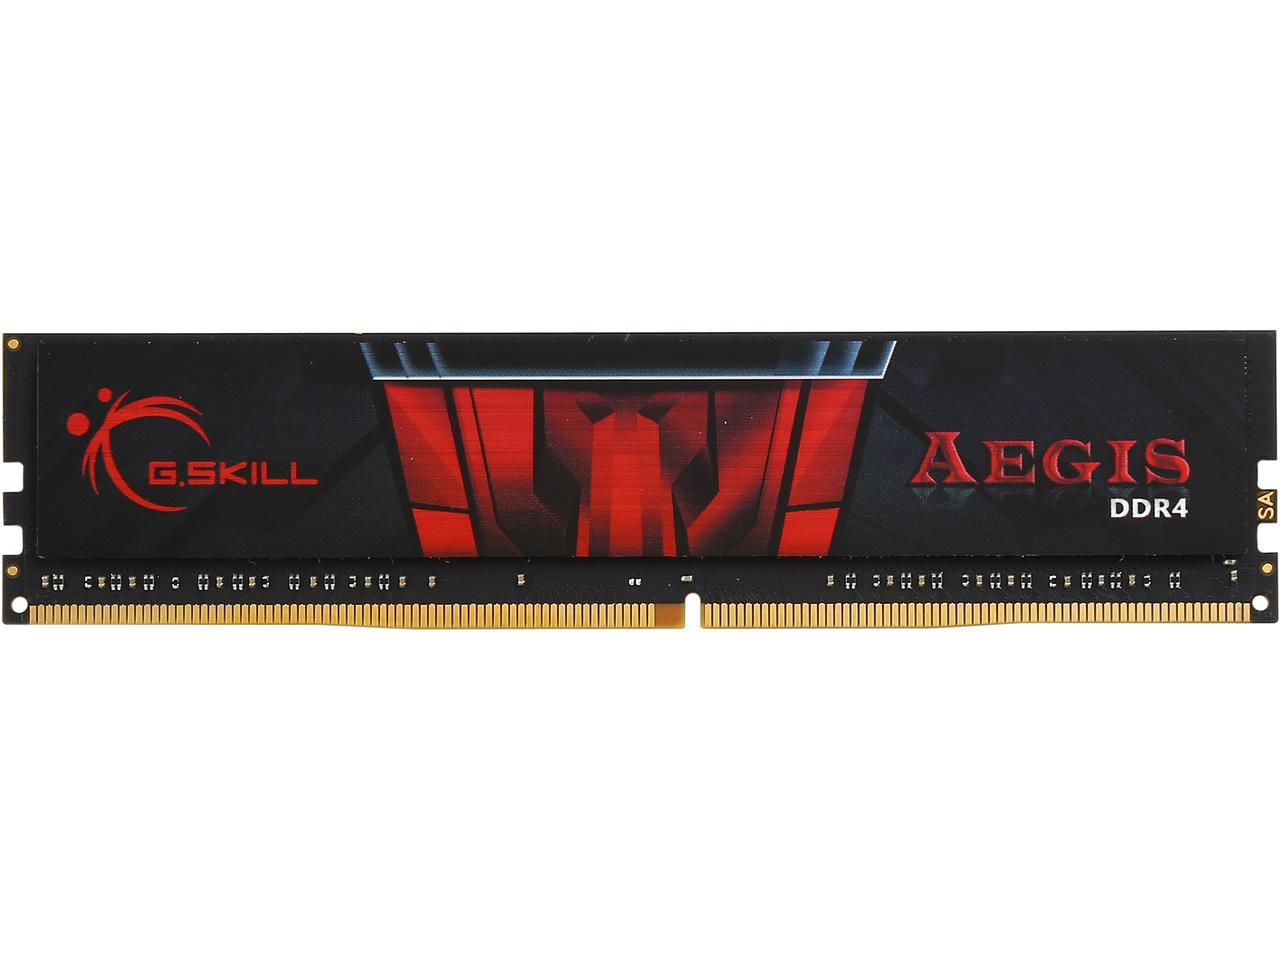 Ram G.Skill Aegis DDR4/4GB/2400Mhz - (F4- 4G/2400 AEGIS)